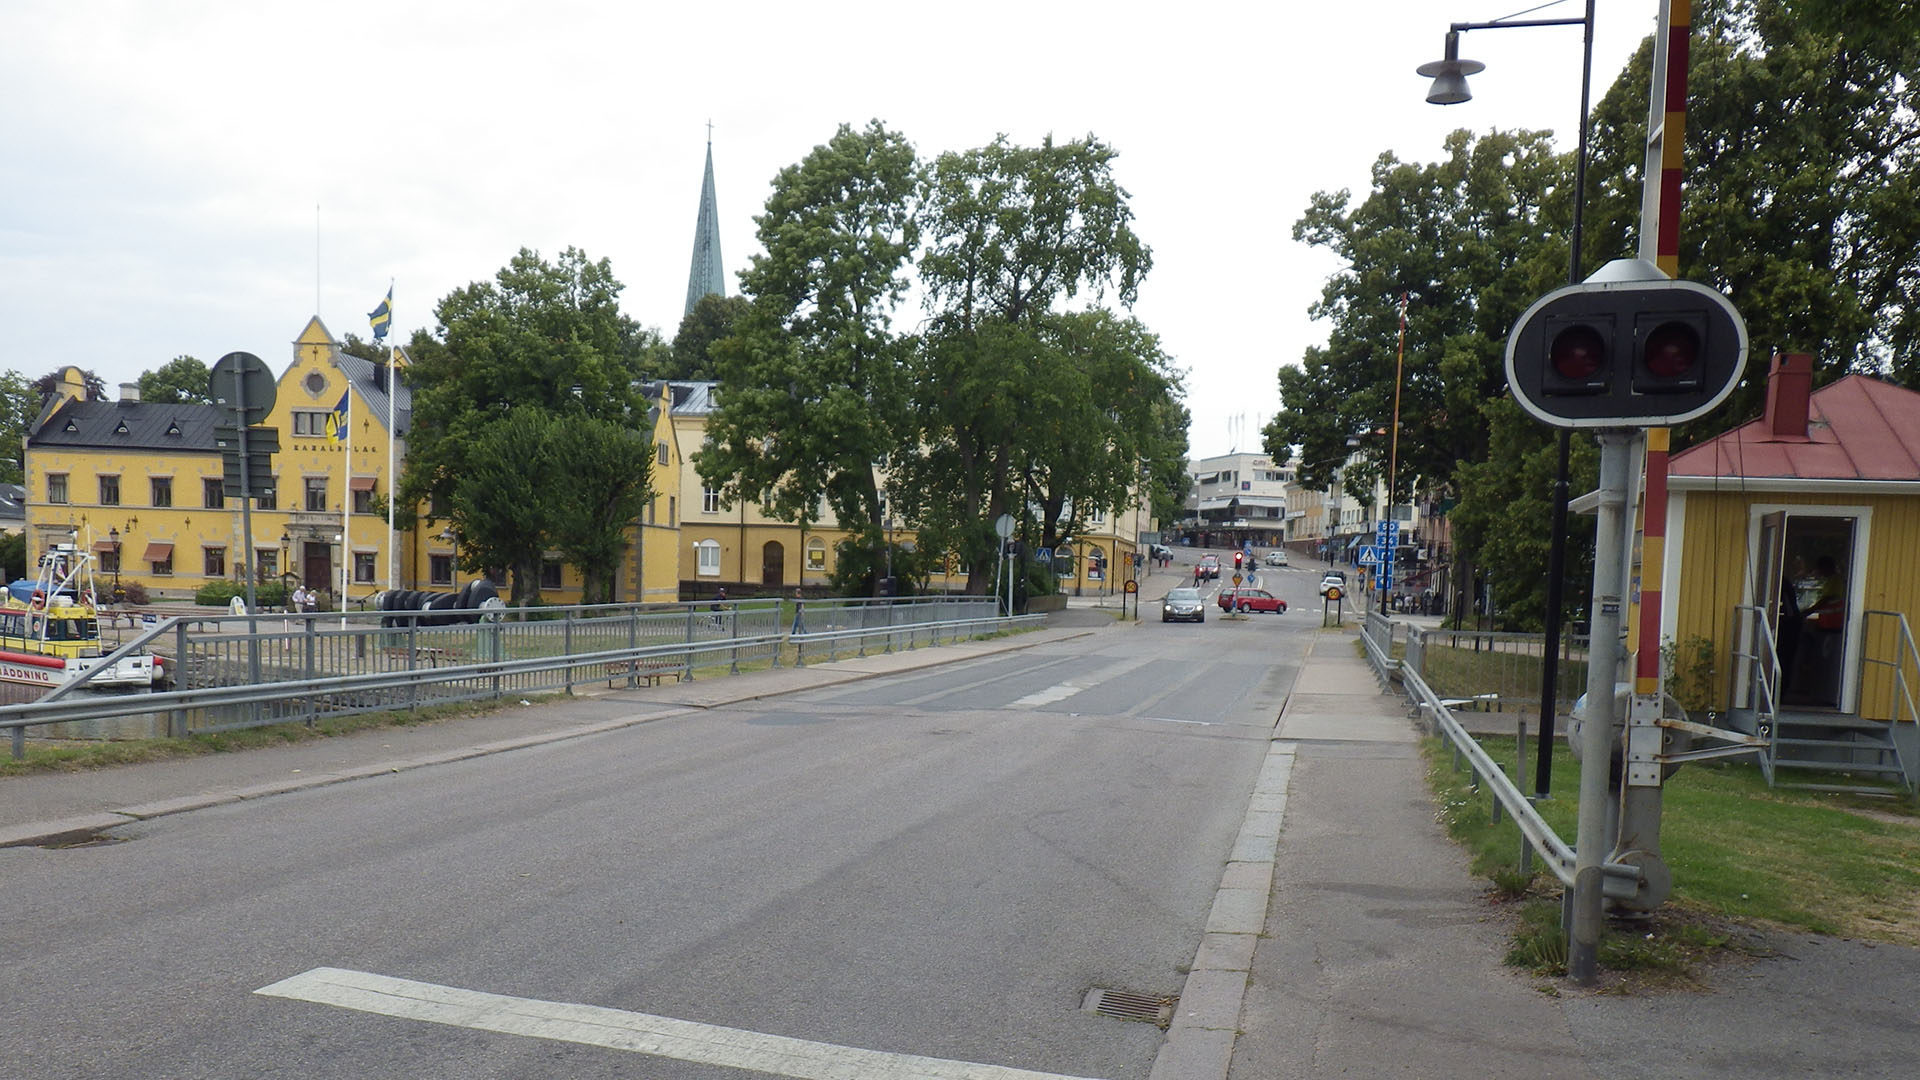 elsystem i linköping ab